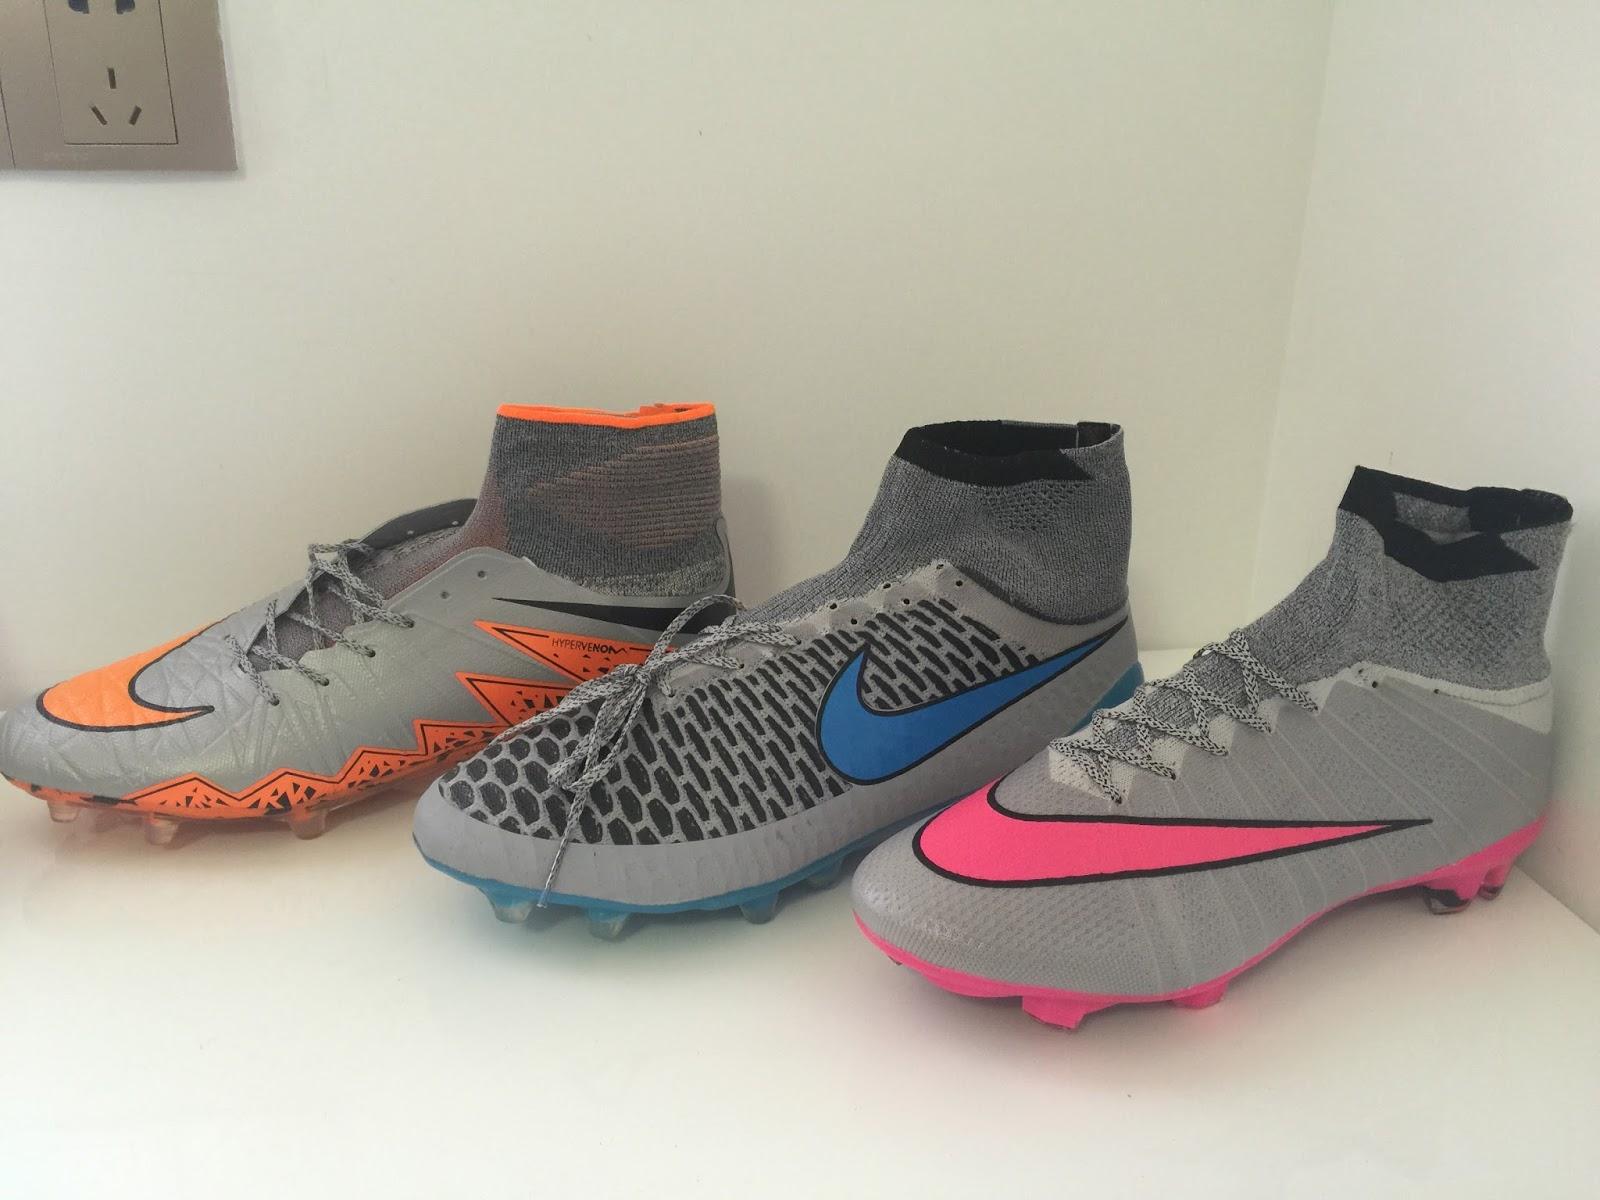 new concept 2c860 50703 Sportscleatscheap.com: Grey / Pink Nike Mercurial Superfly ...